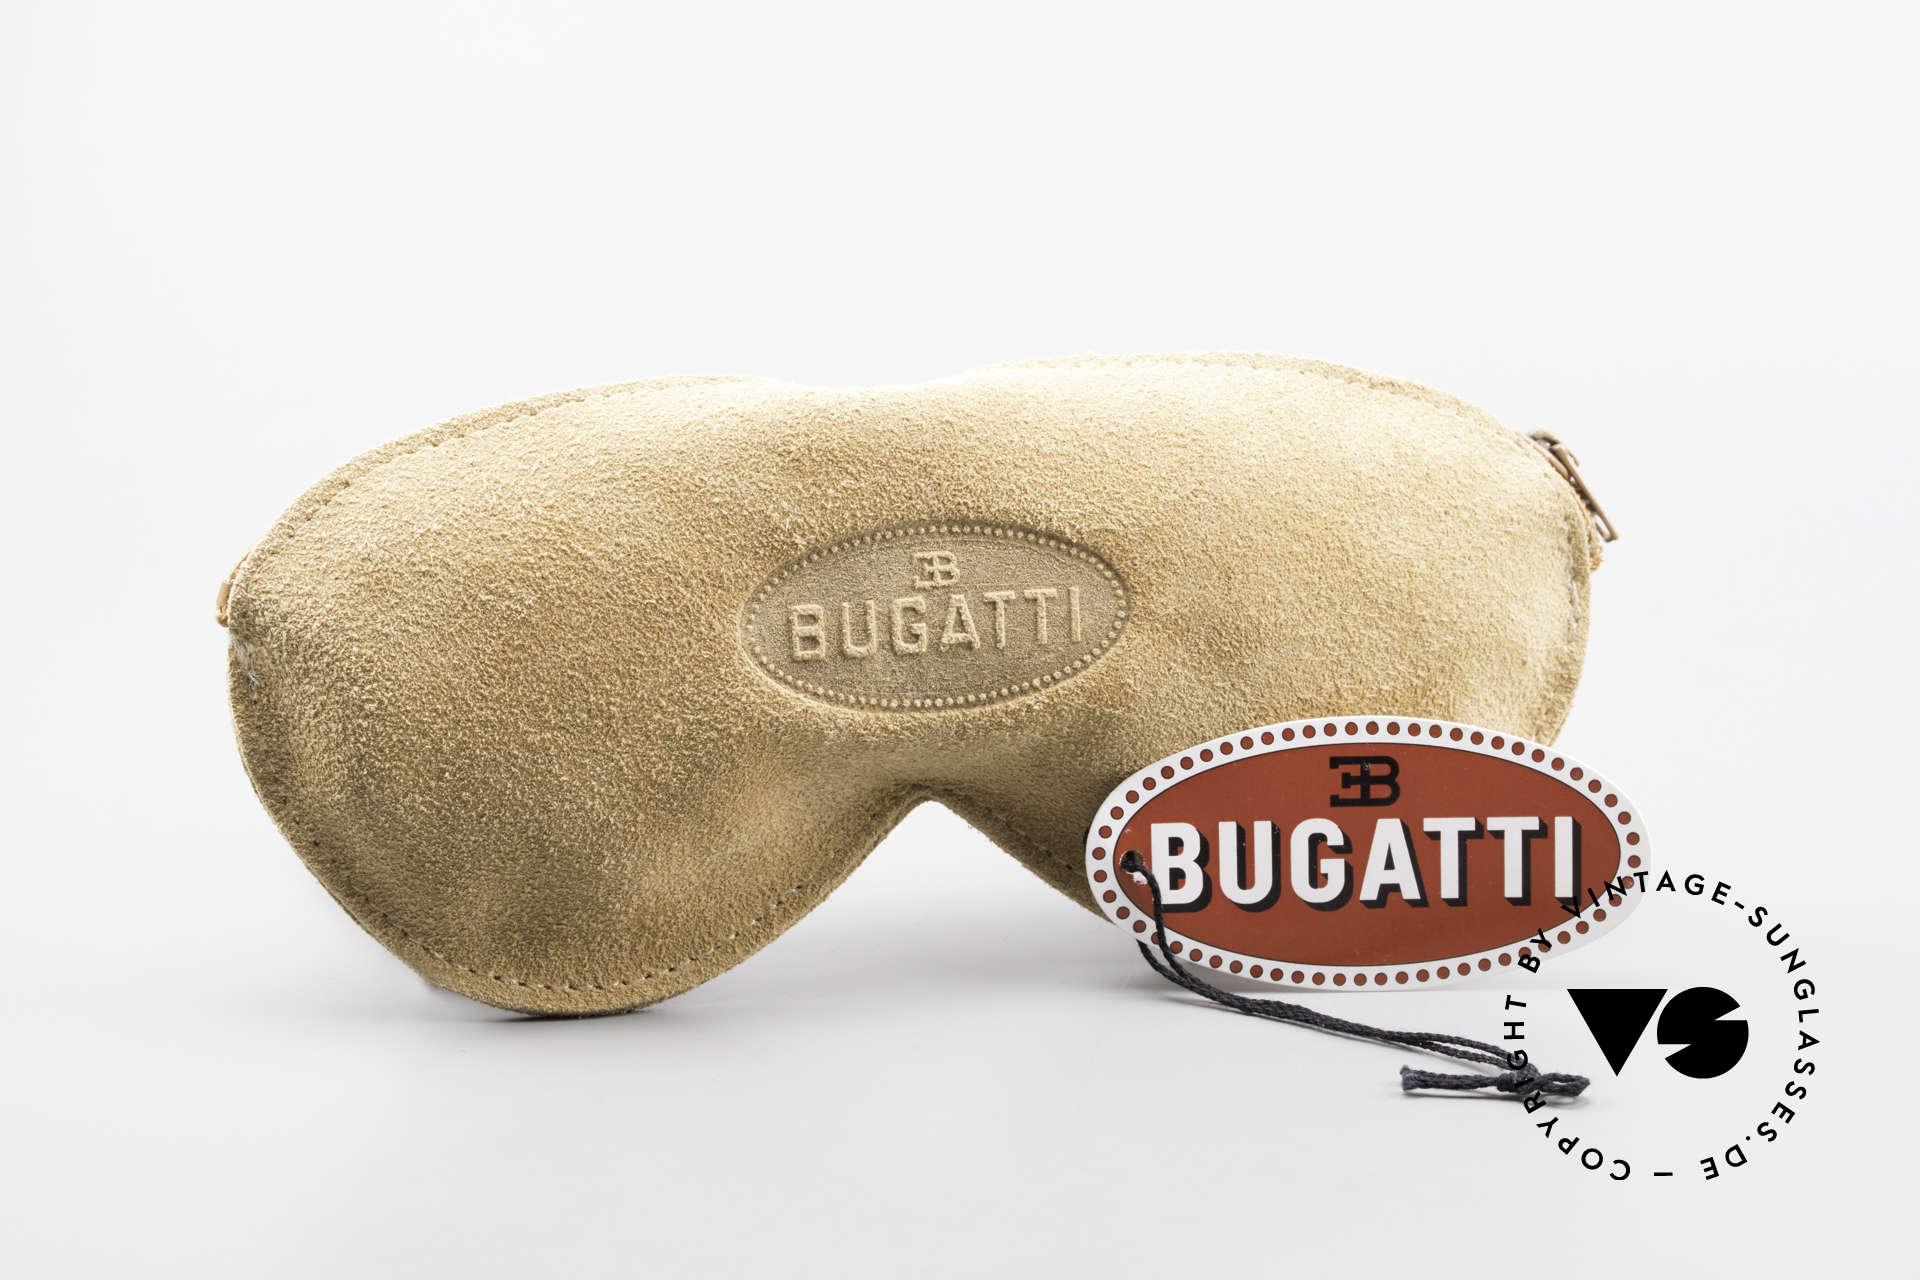 Bugatti 08104 Men's Vintage 80's Eyeglasses, Size: medium, Made for Men